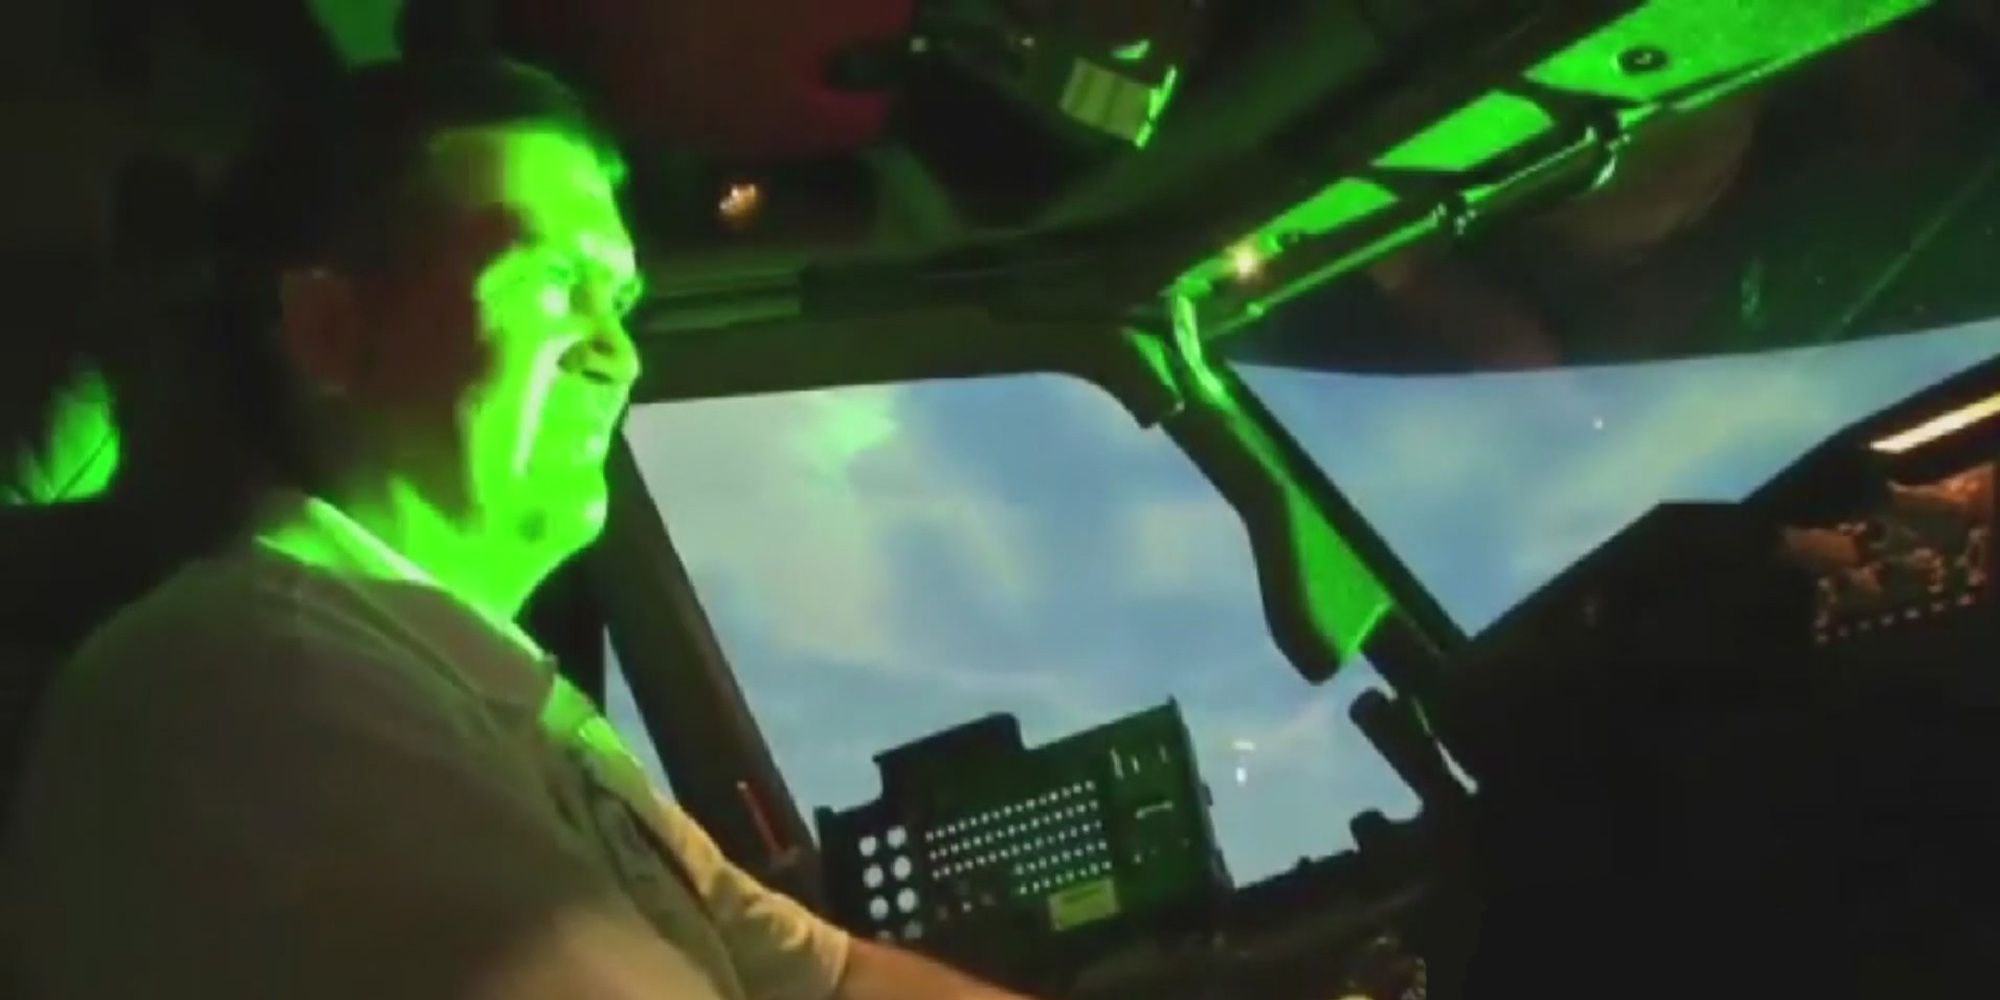 laser apunta a avion 3